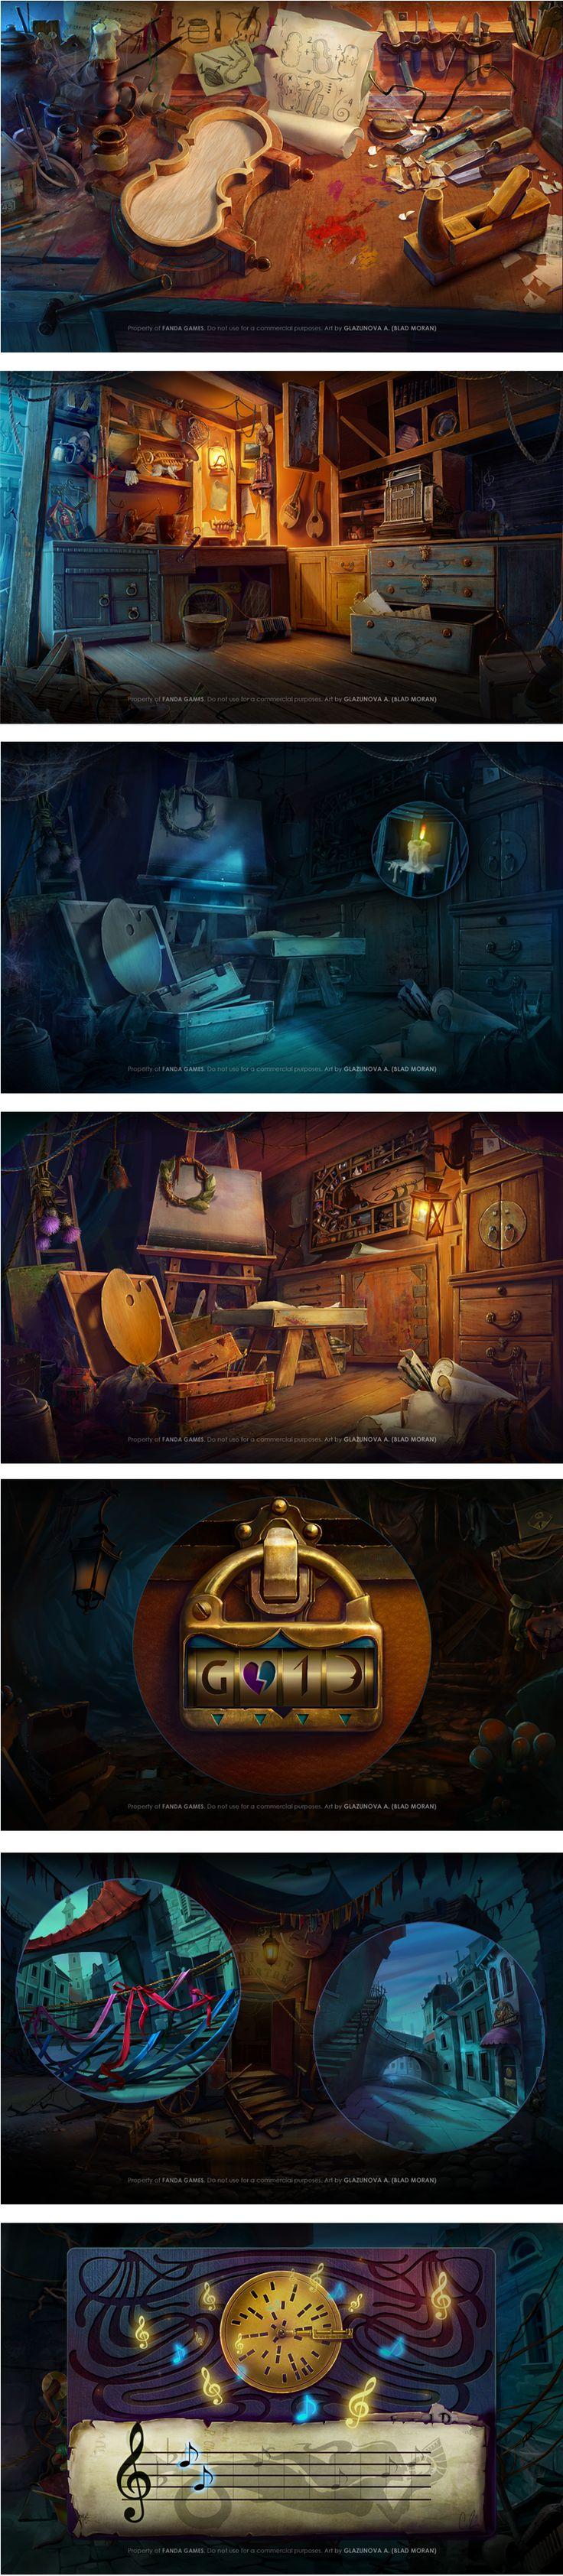 Bluebeard's Castle: Son of the Heartless (part 2), Illustration © Nastya Glazunova